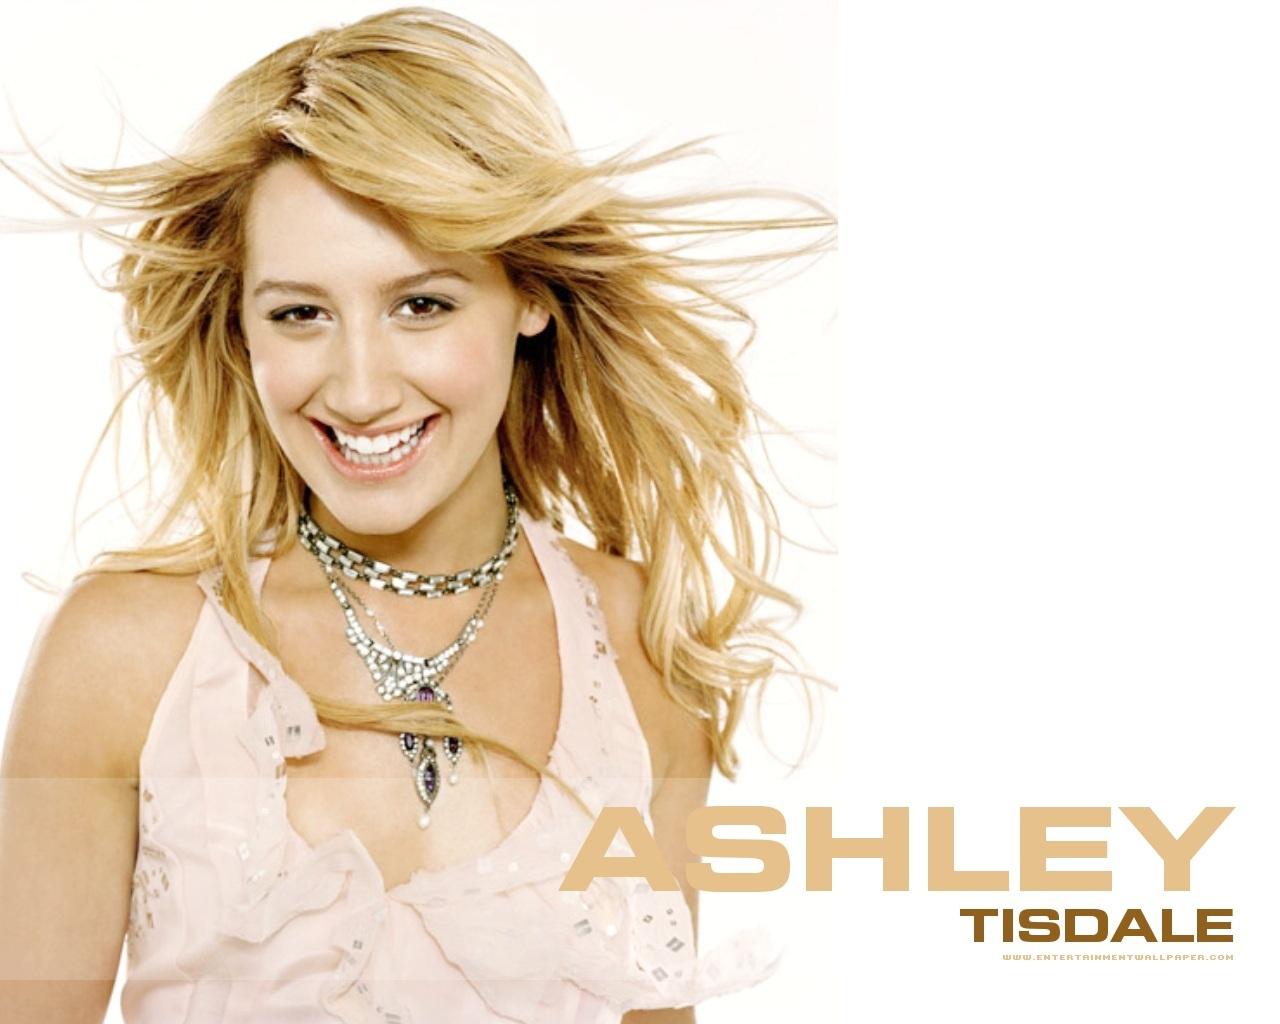 Ashley Tisdale - ashley-tisdale wallpaper